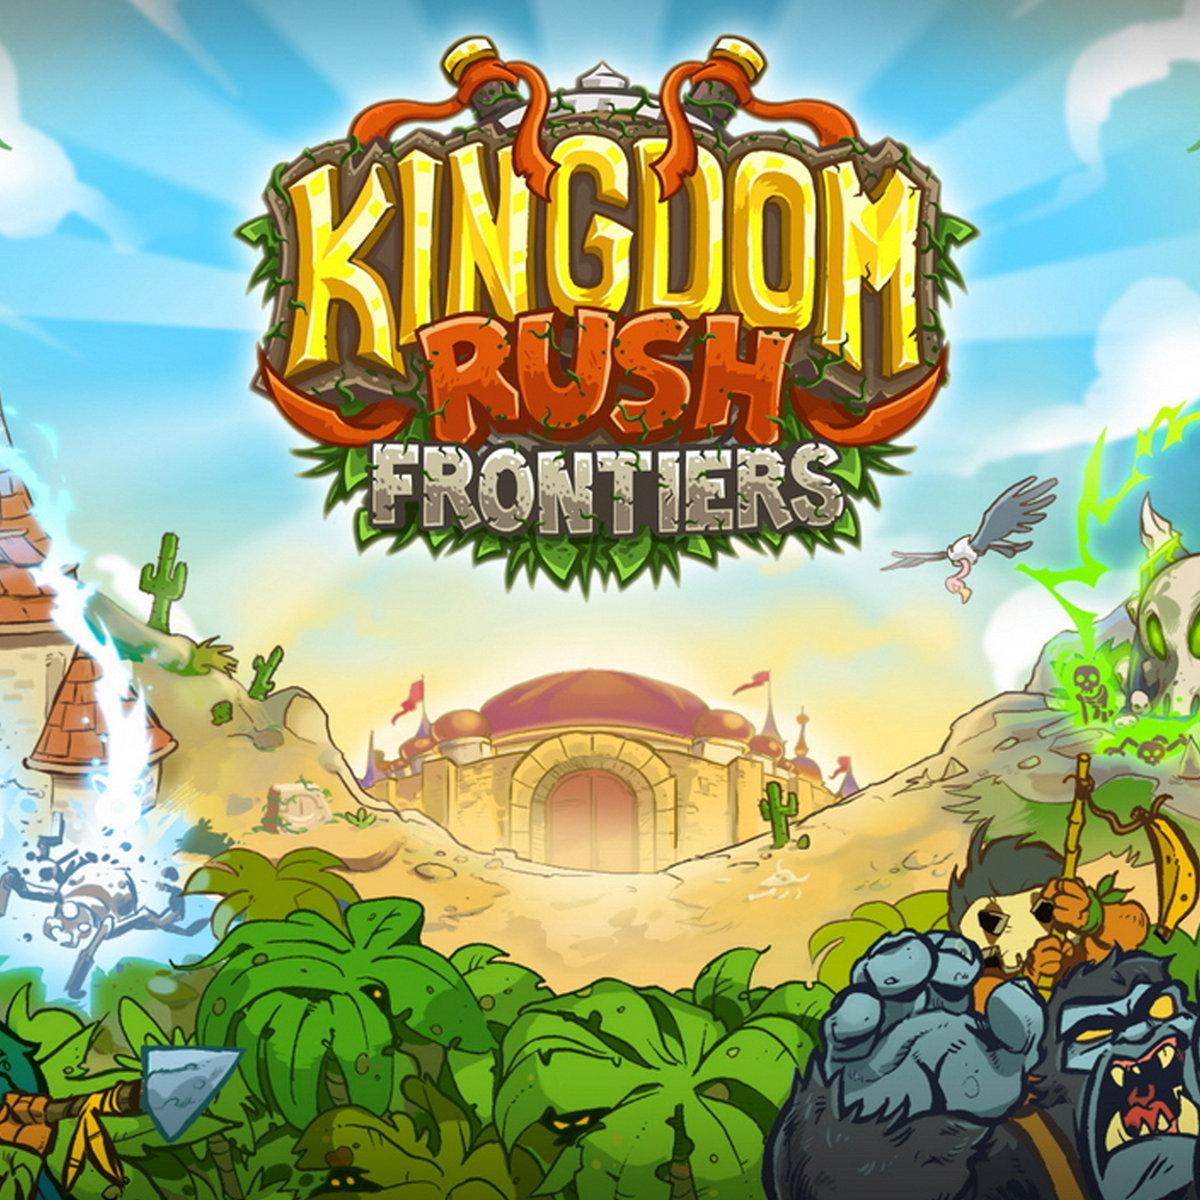 Kingdom Rush Original Map | HyperDuck SoundWorks on bo2 origins, marvel vs. capcom origins, flight origins, deadpool origins, dayz origins,